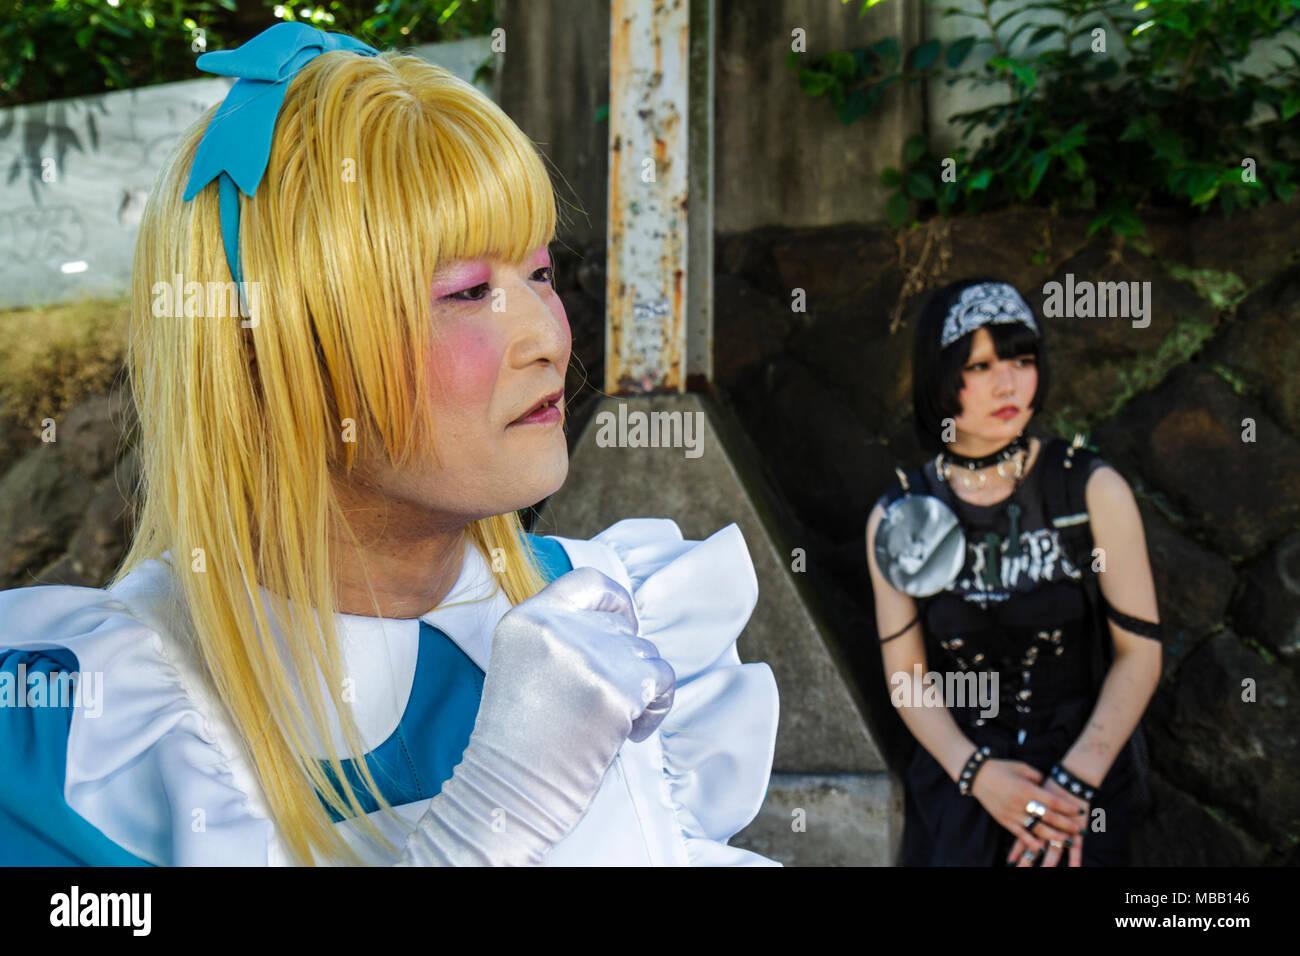 Tokyo Japan Harajuku Asian man cosplay costume play cross dresser dressed like female blonde wig - Stock Image